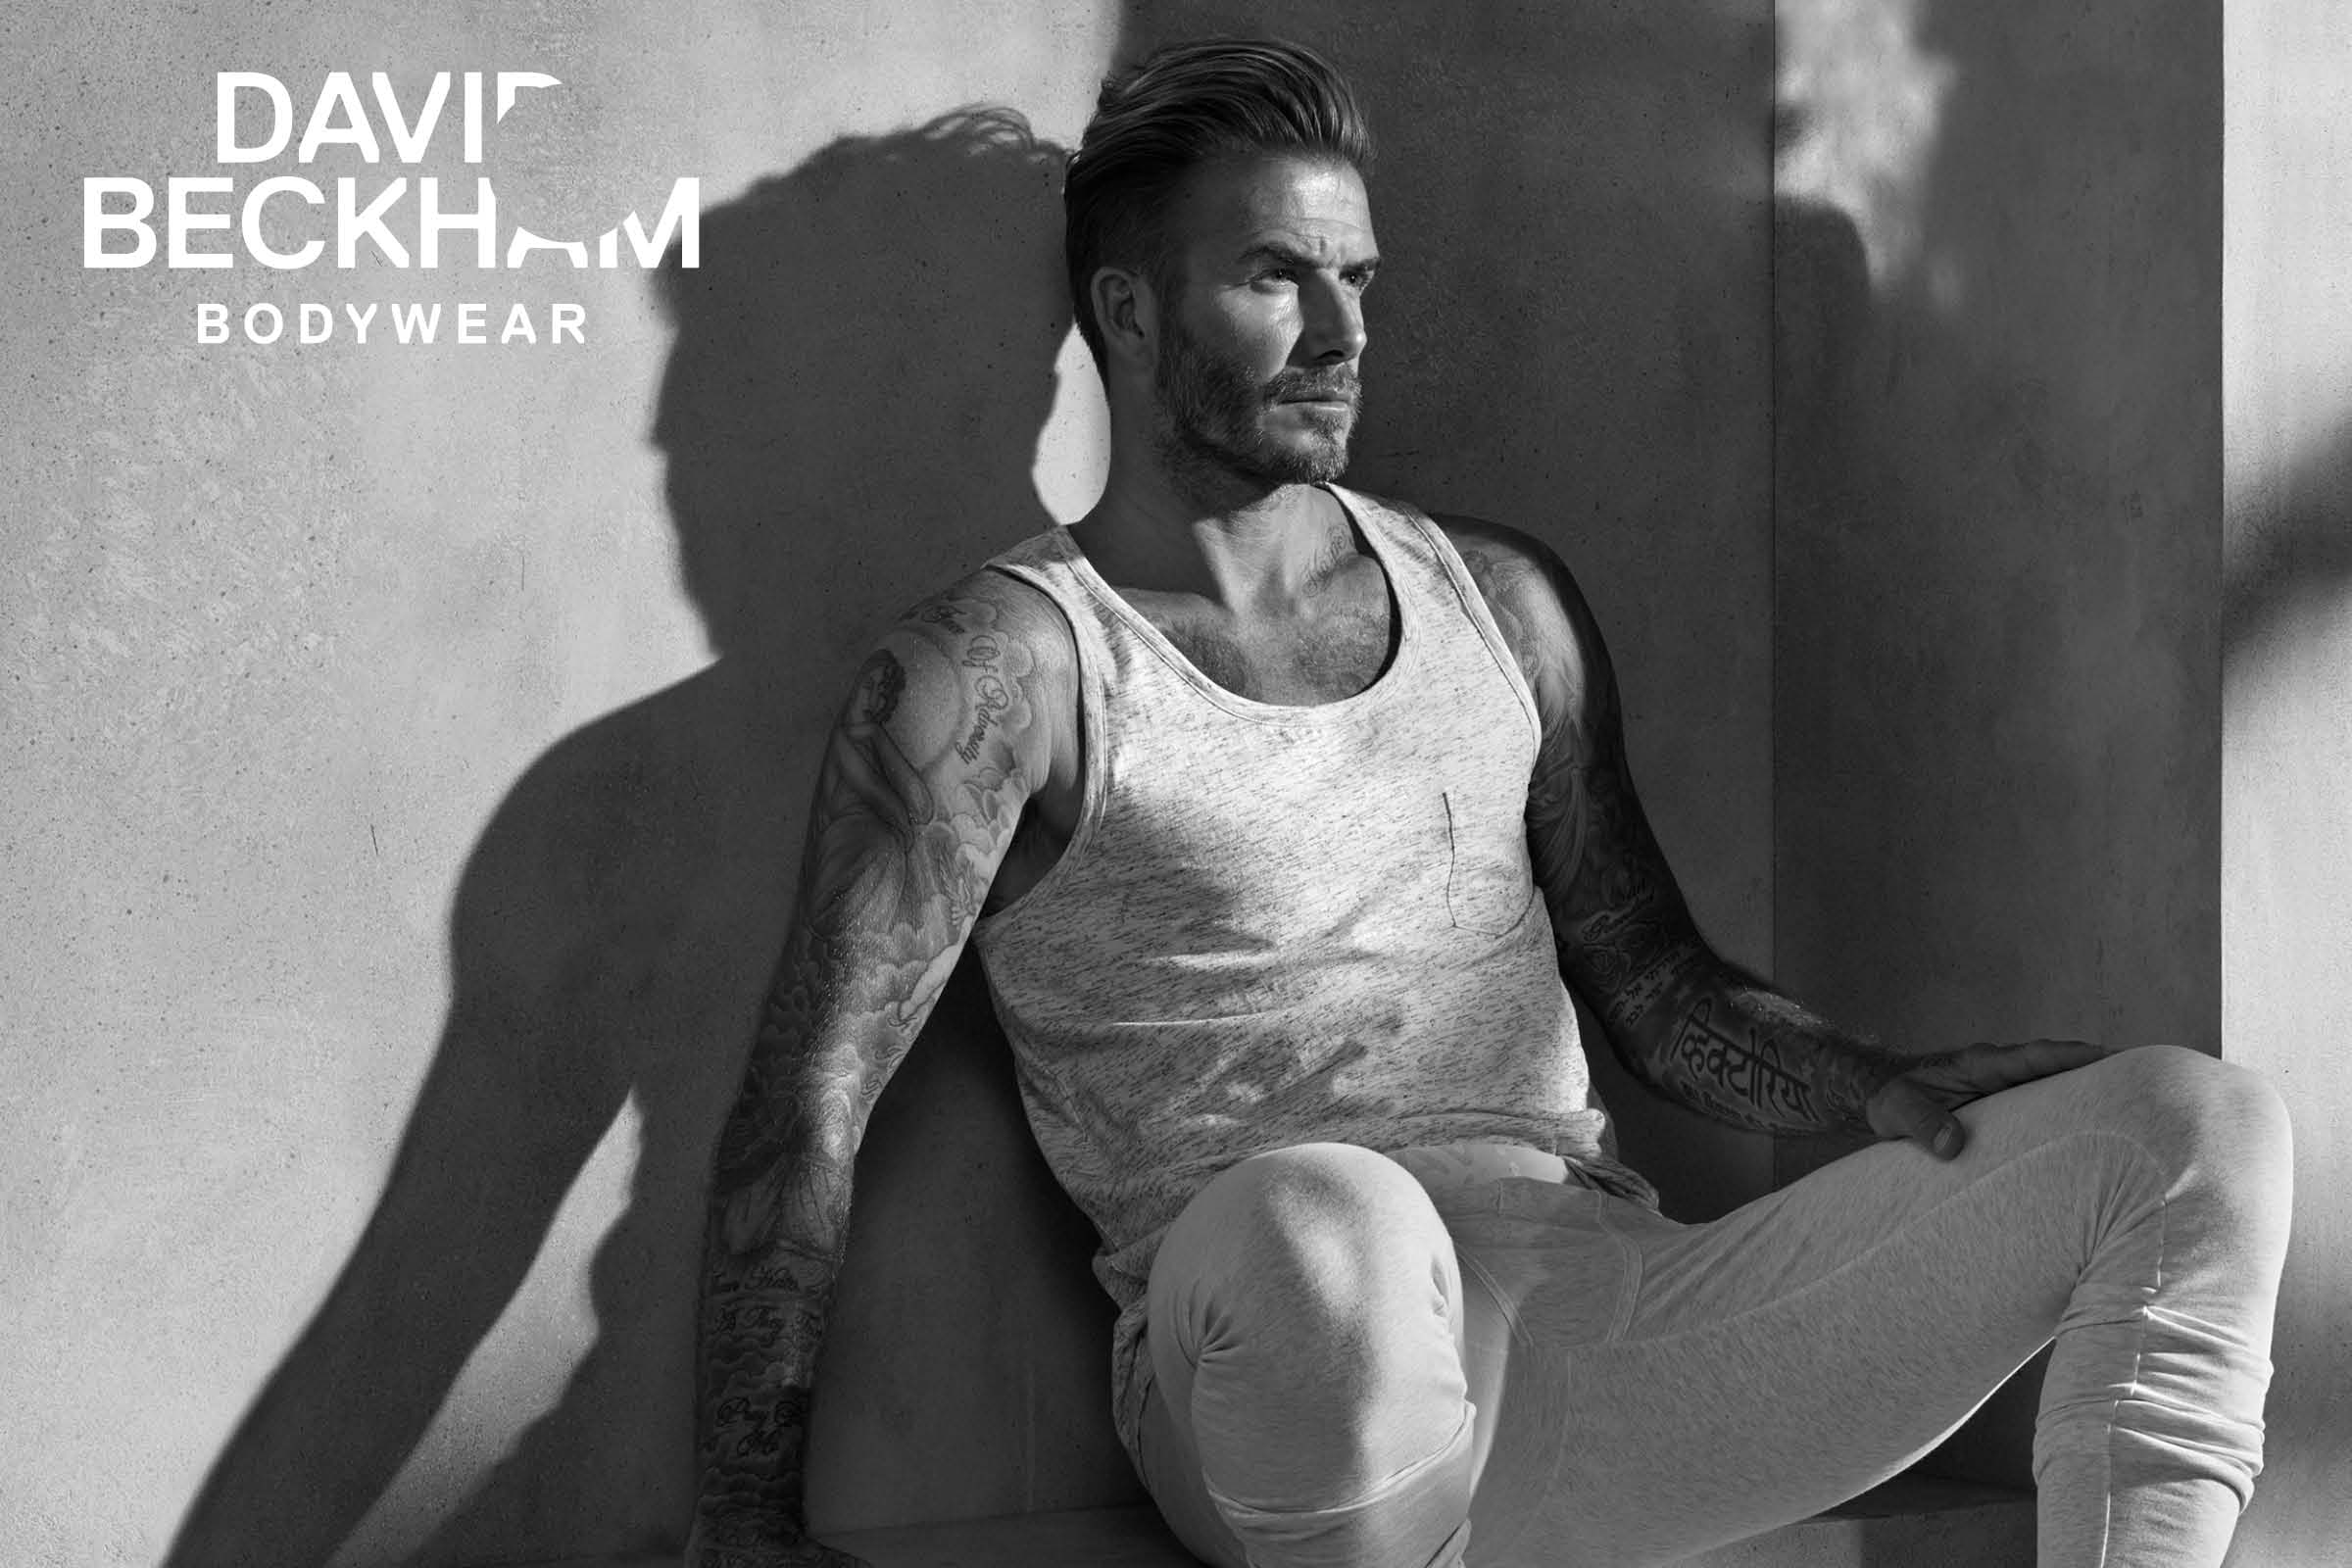 5PB-Beckham-Bodywear-CPD-2-en_GEN.jpg